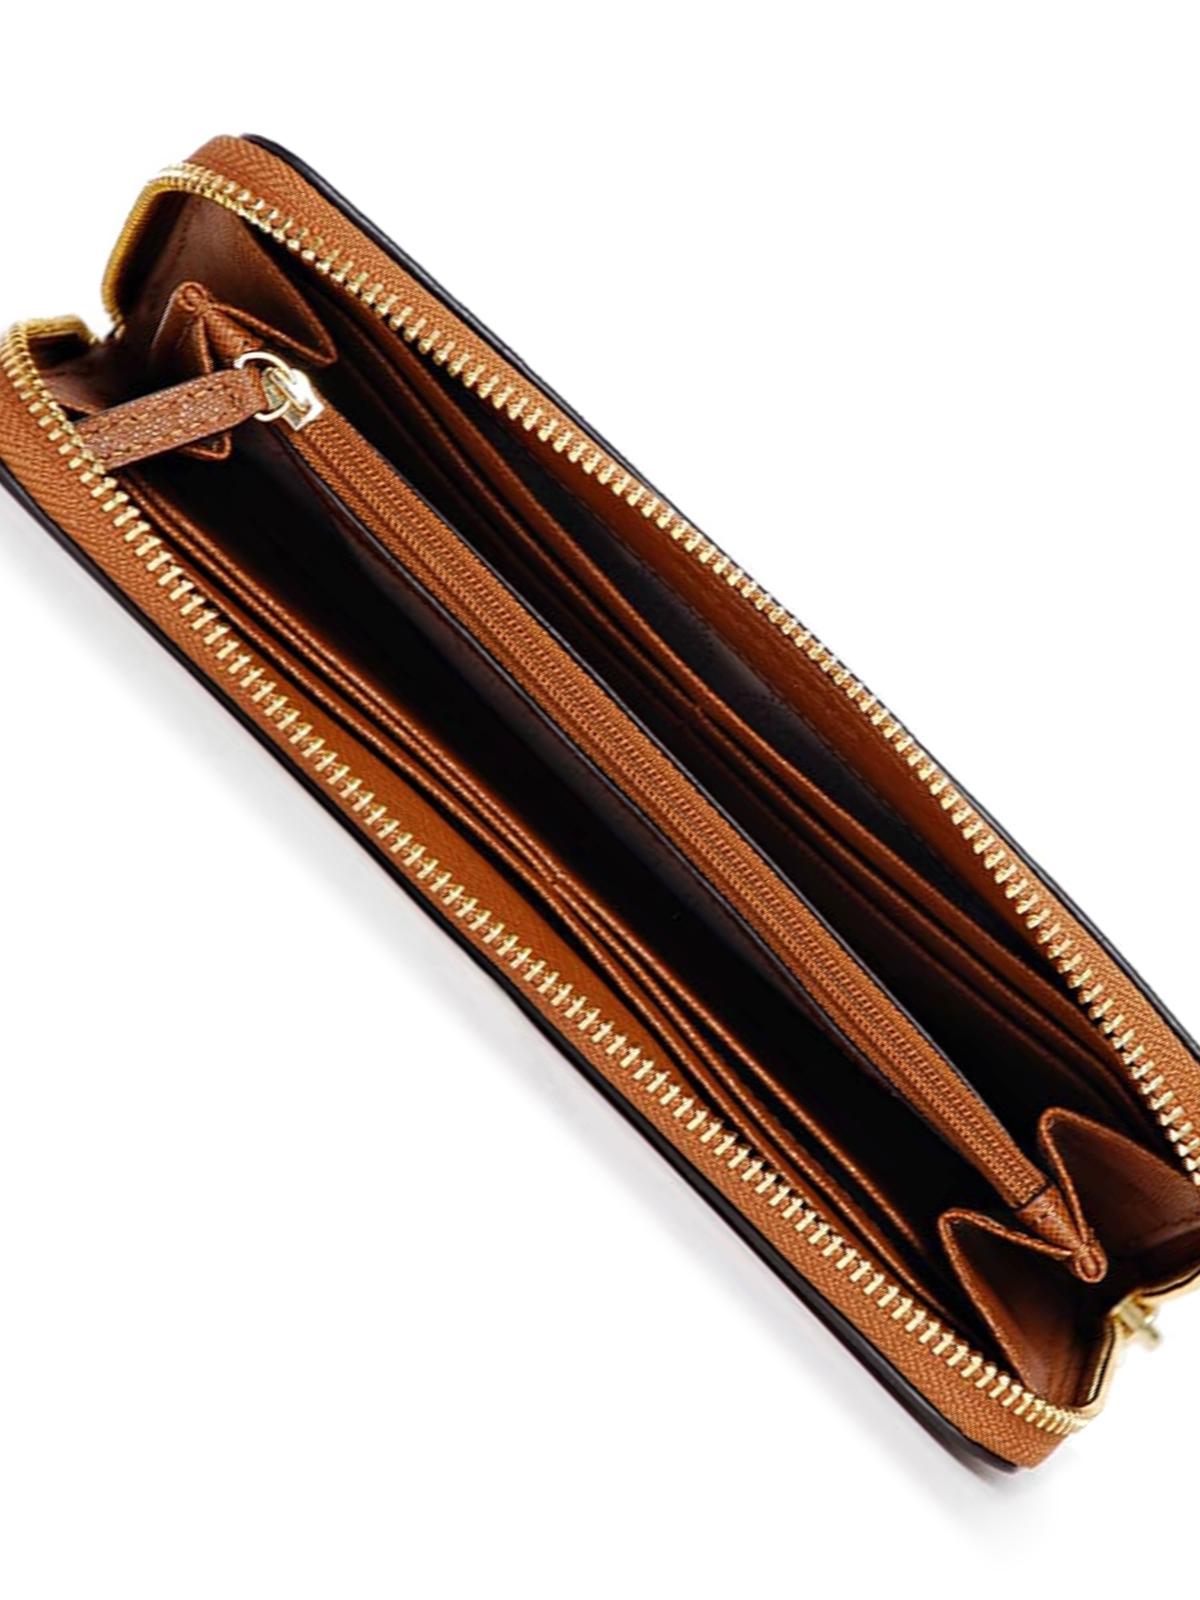 08e20b6a3748 iKRIX MICHAEL KORS: wallets & purses - Jet Set Travel Continental wallet